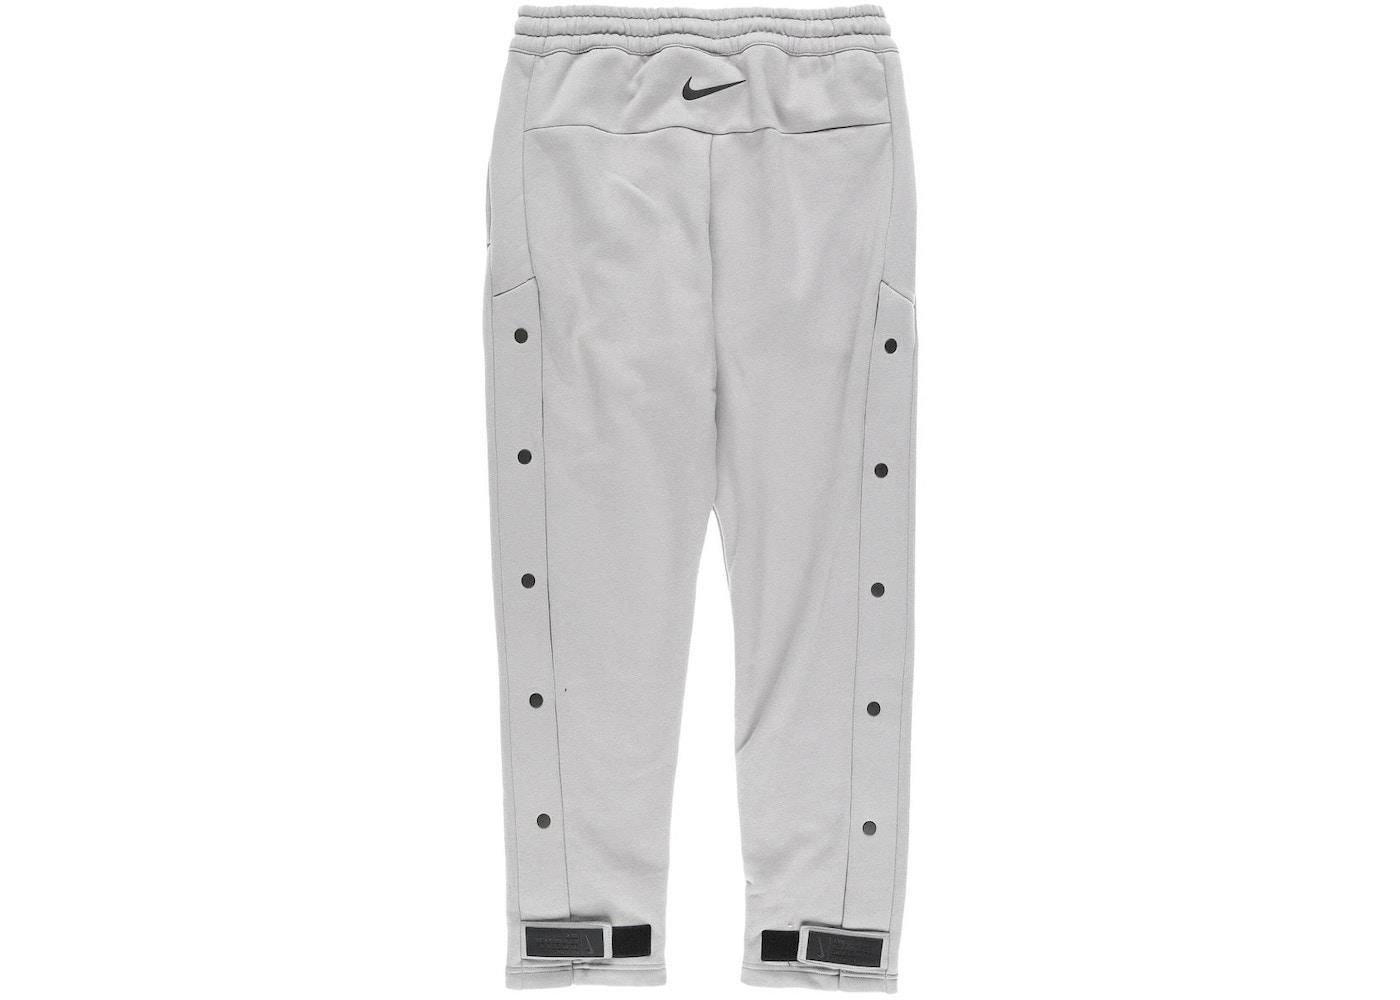 93c4778f Streetwear - FEAR OF GOD Bottoms - Volatility